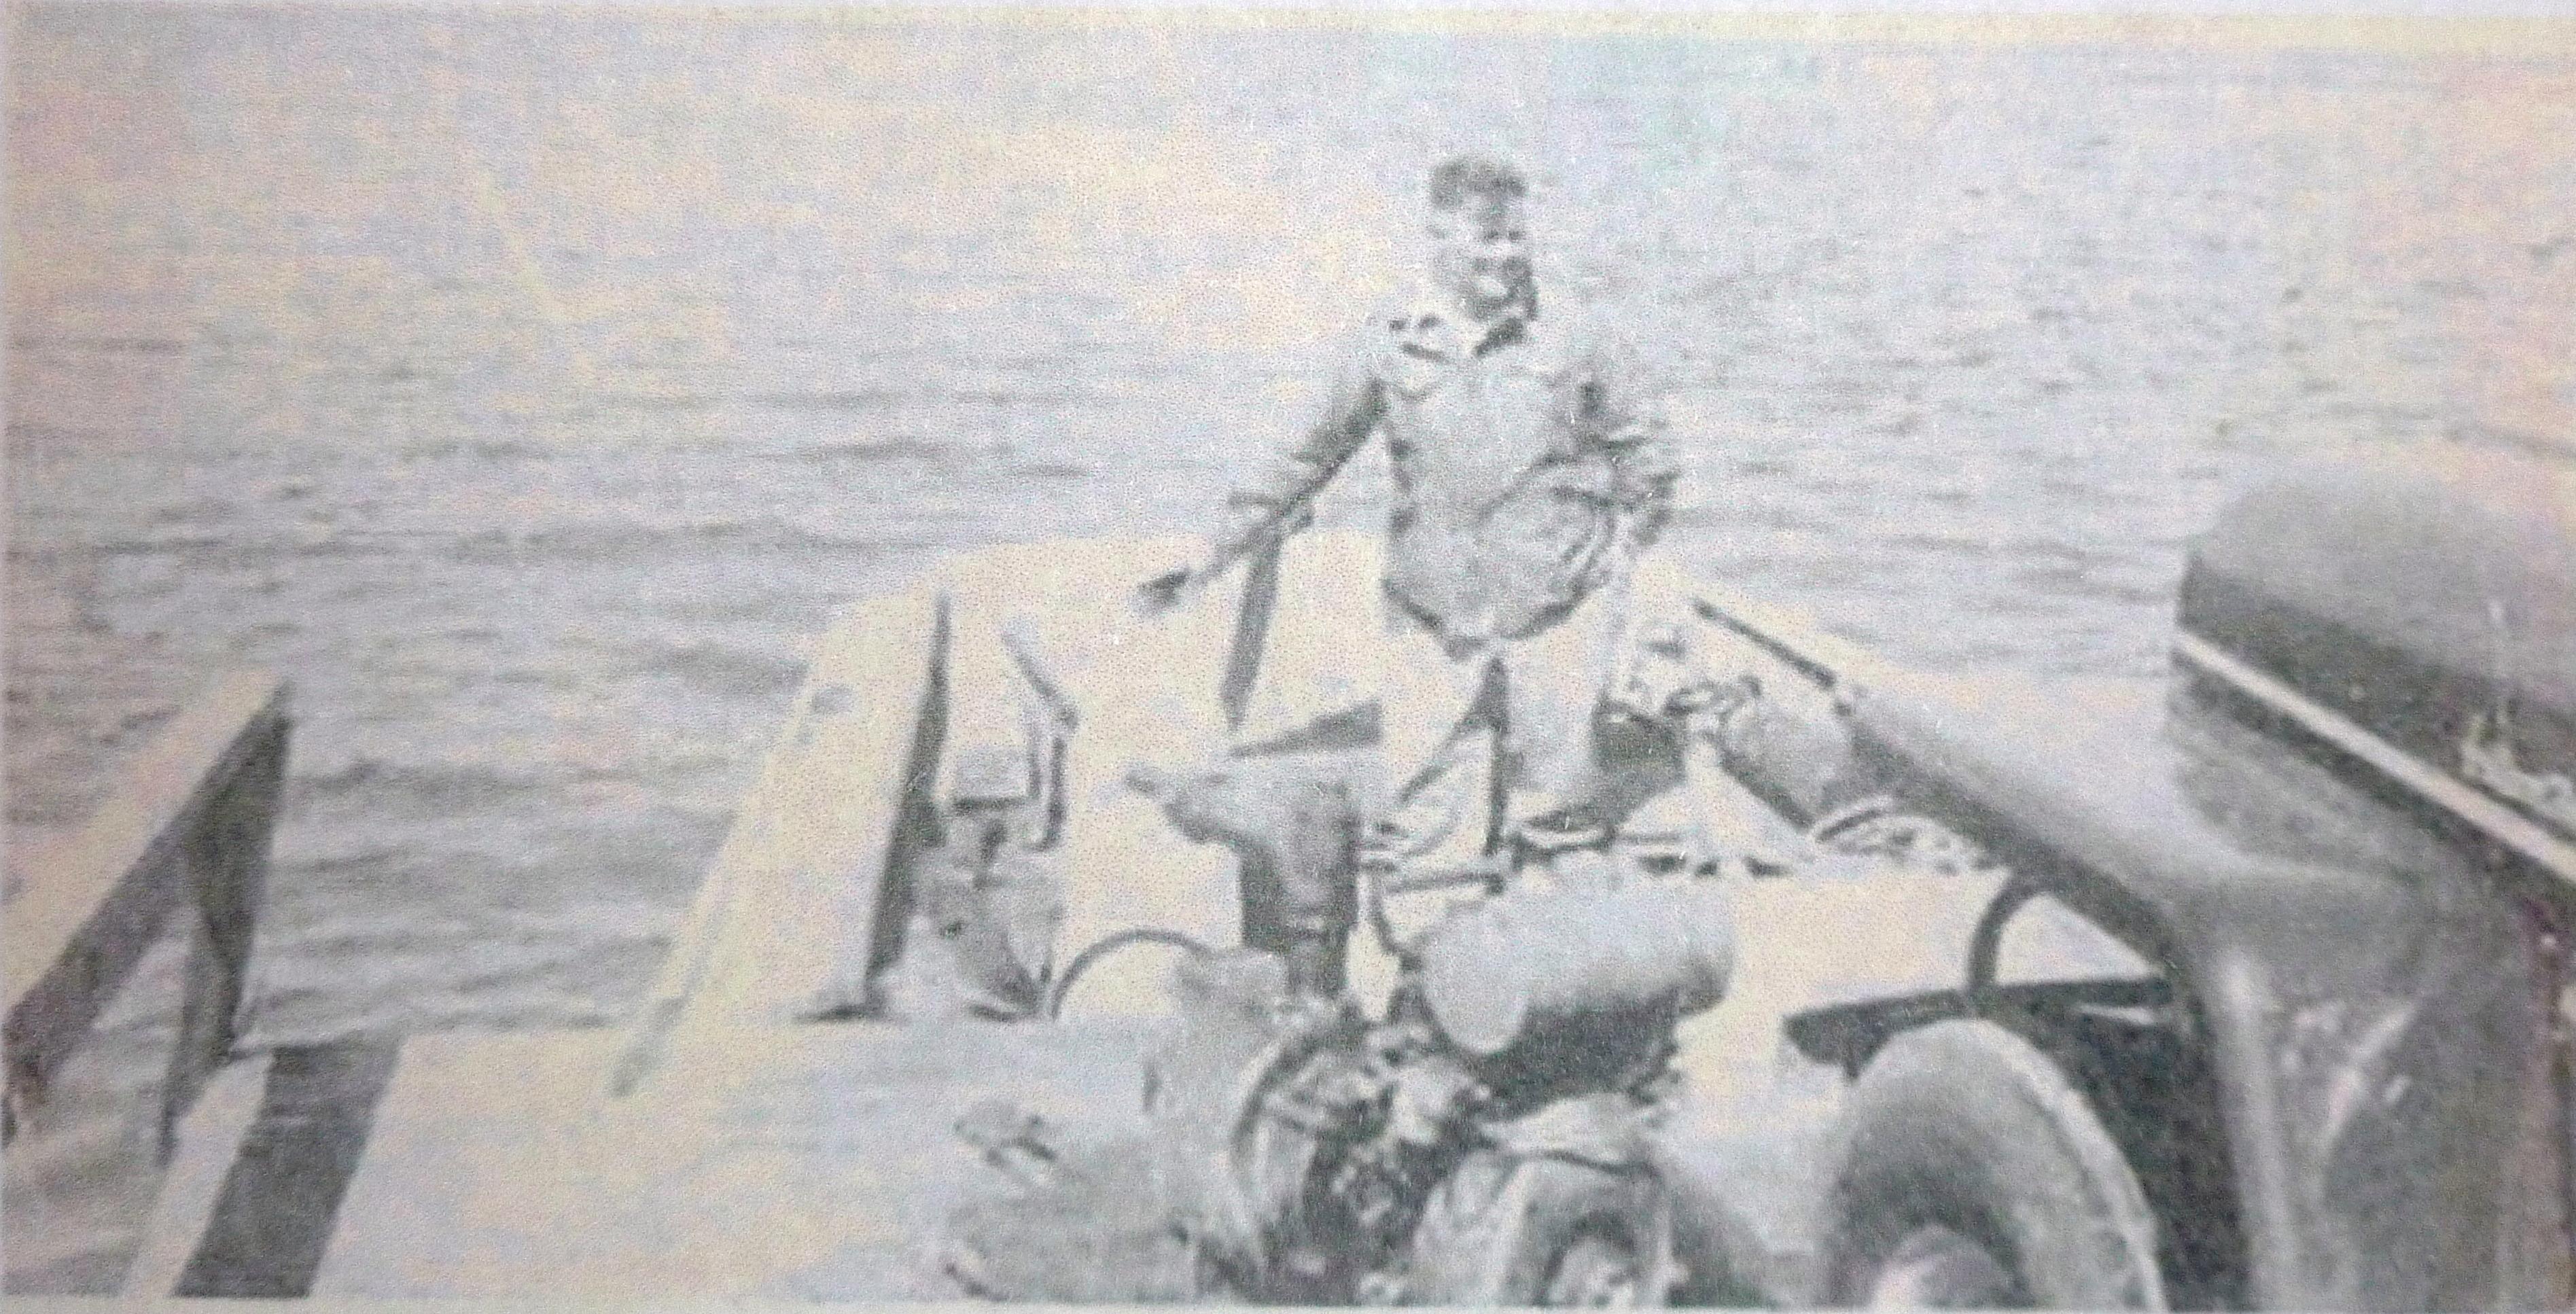 1950 Ferry